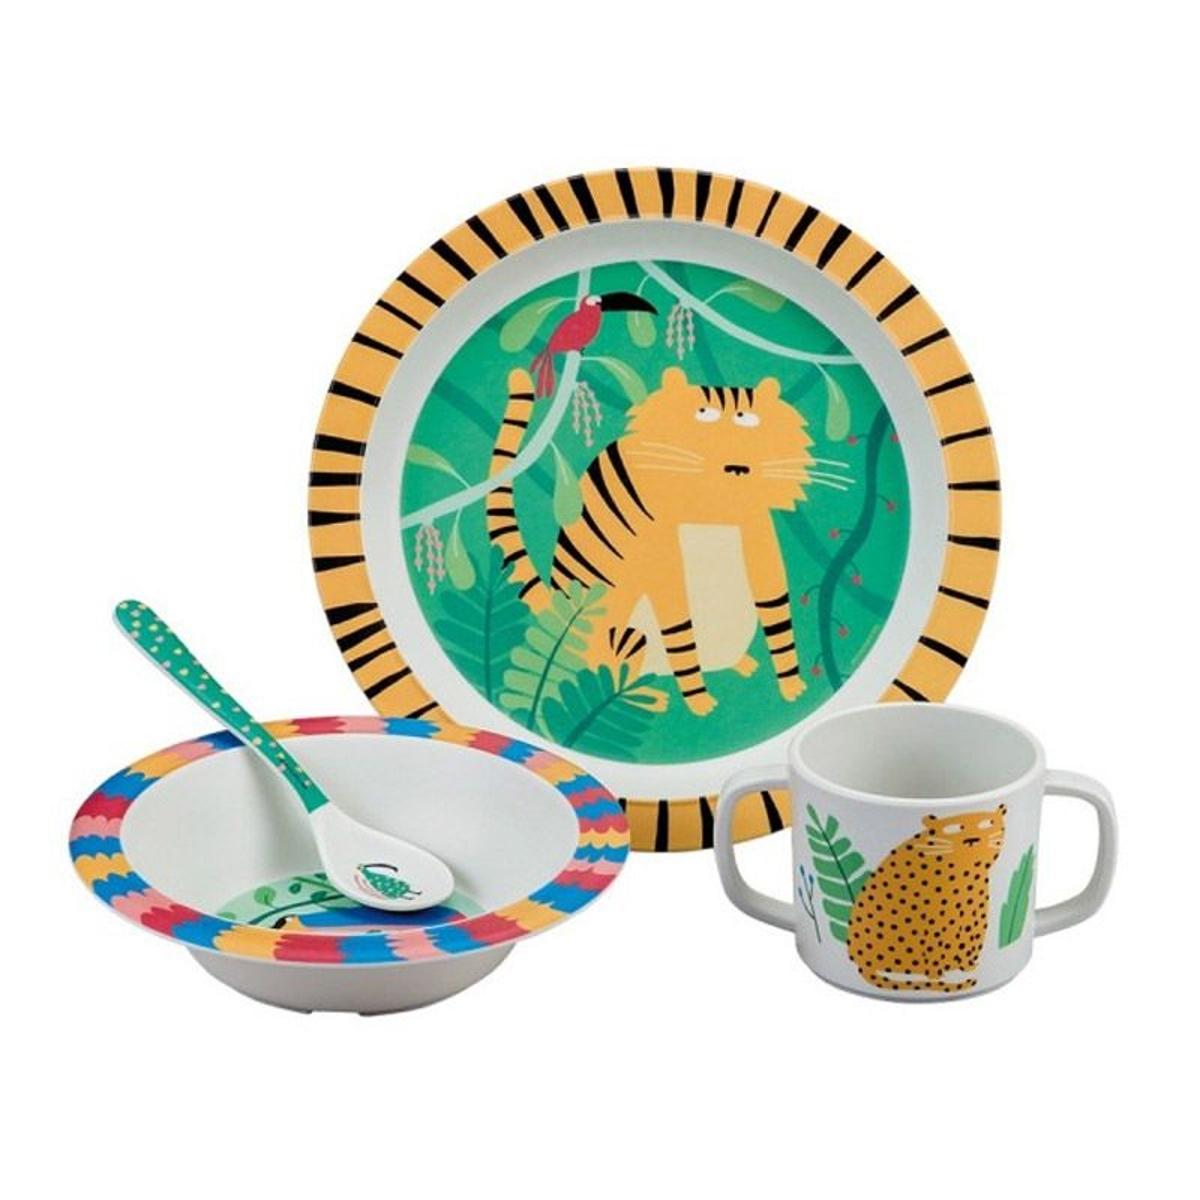 Coffret cadeau La jungle : 4 pièces repas